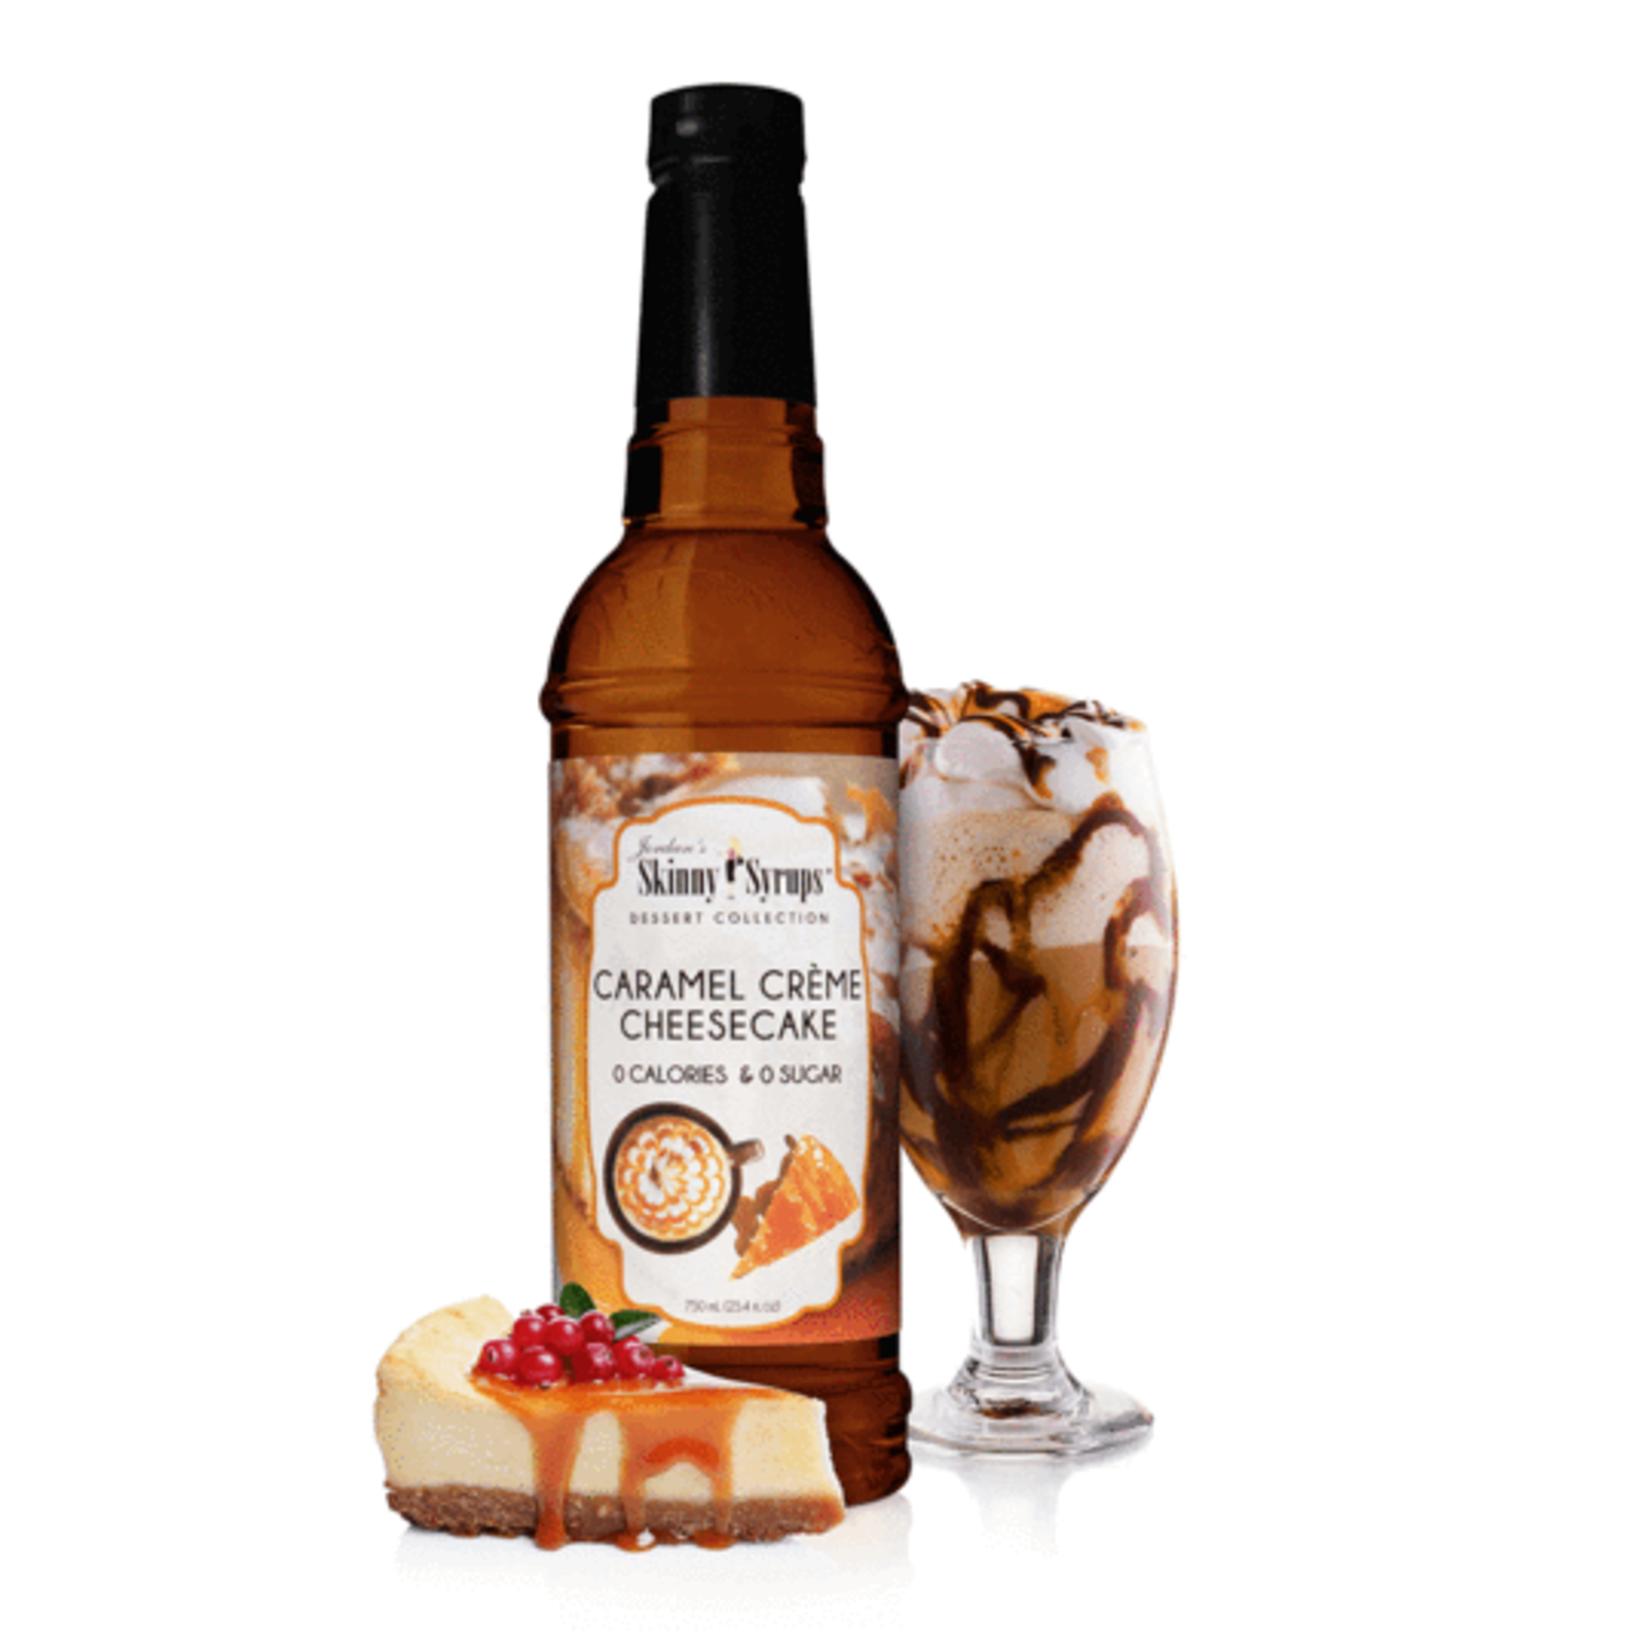 Jordan's Skinny Mixes Skinny Caramel Creme Cheesecake Syrup